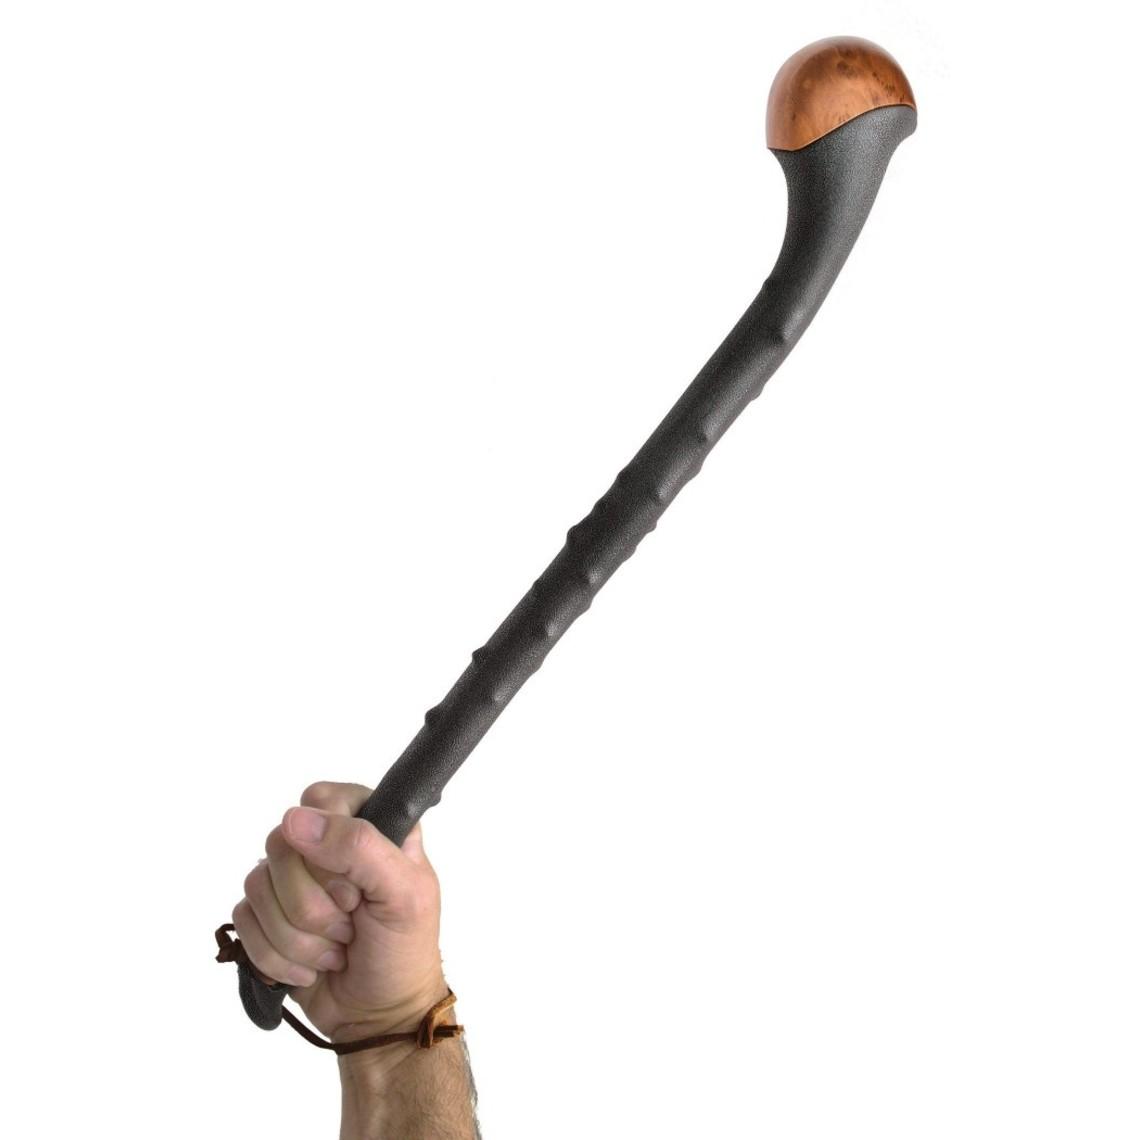 United Cutlery Blackthorn shillelaghs, bastone da passeggio irlandese